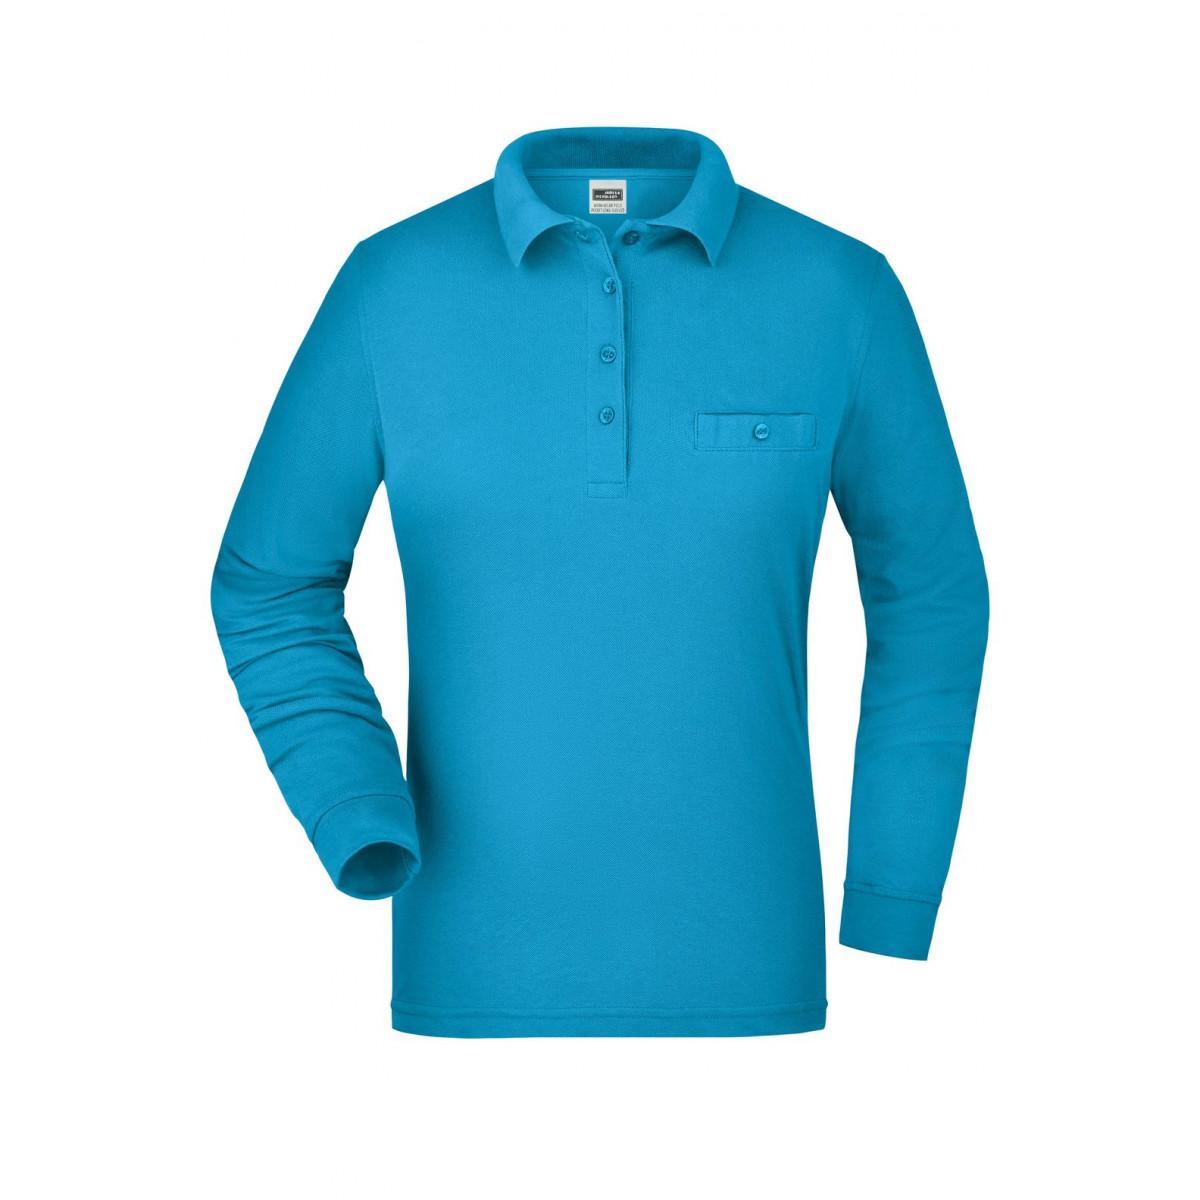 Рубашка поло женская JN865 Ladies Workwear Polo Pocket Longsleeve - Бирюзовый